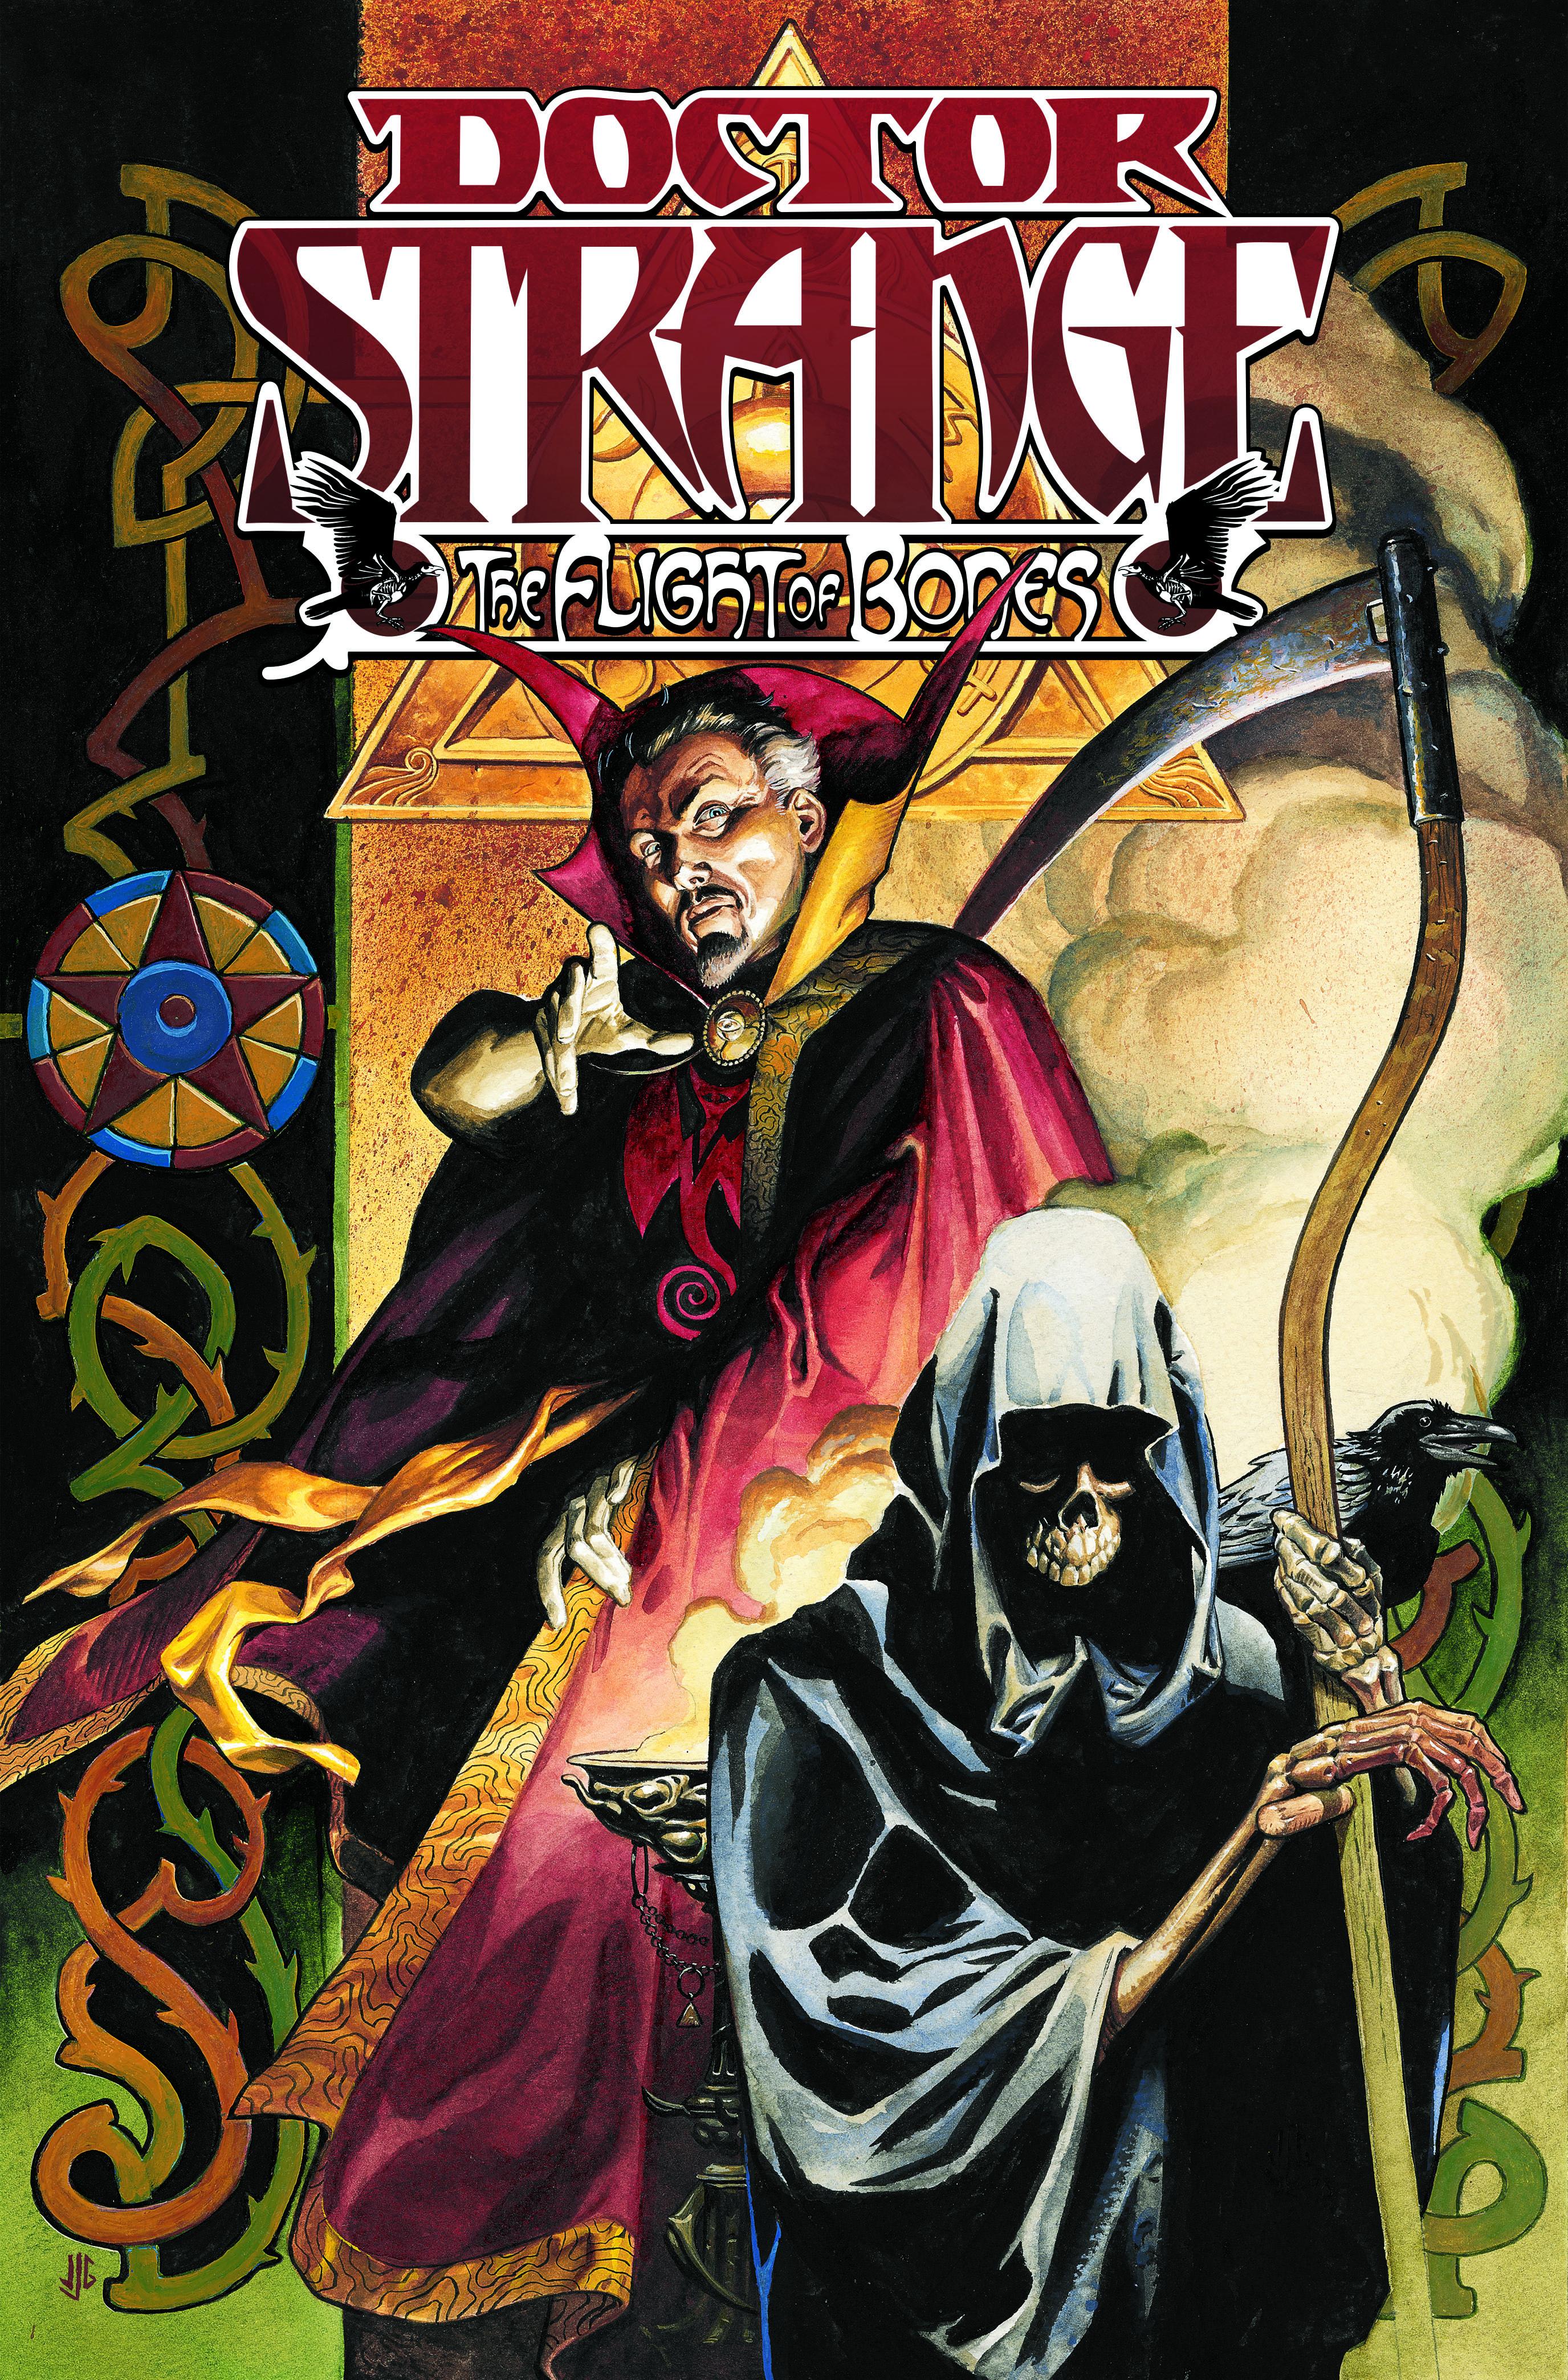 Doctor Strange: The Flight of Bones (Trade Paperback)